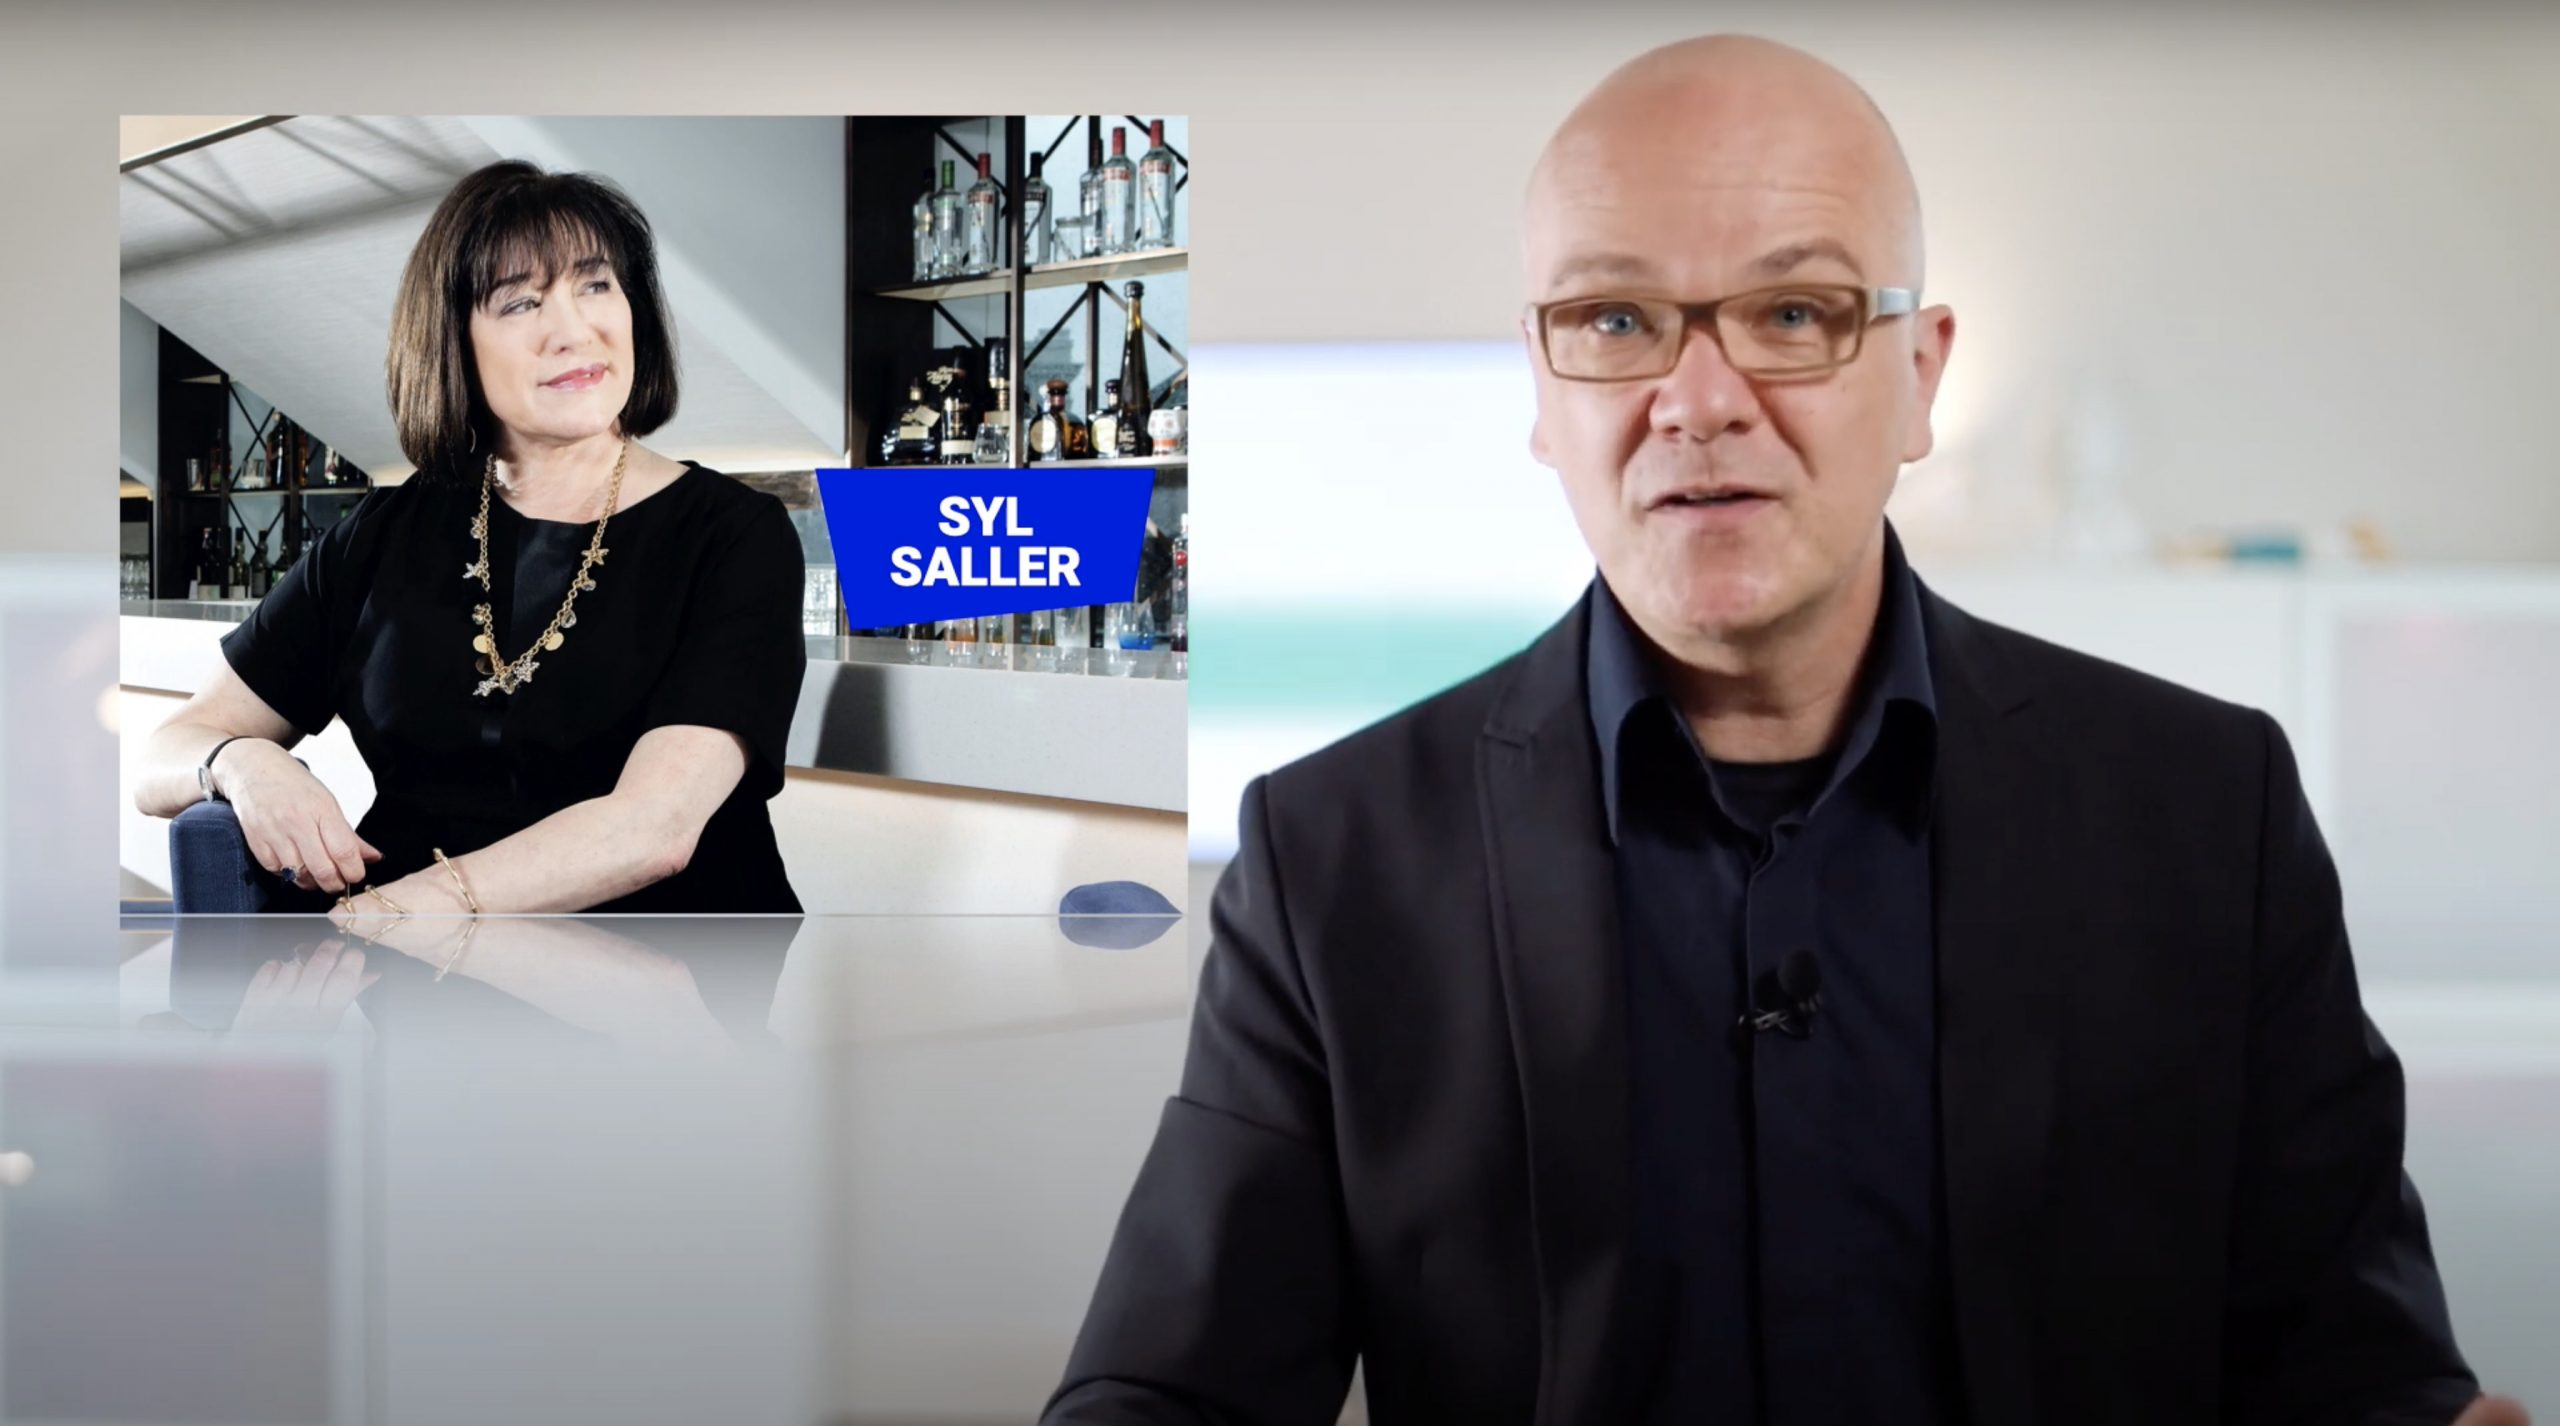 Marketing Leadership Masterclass Video